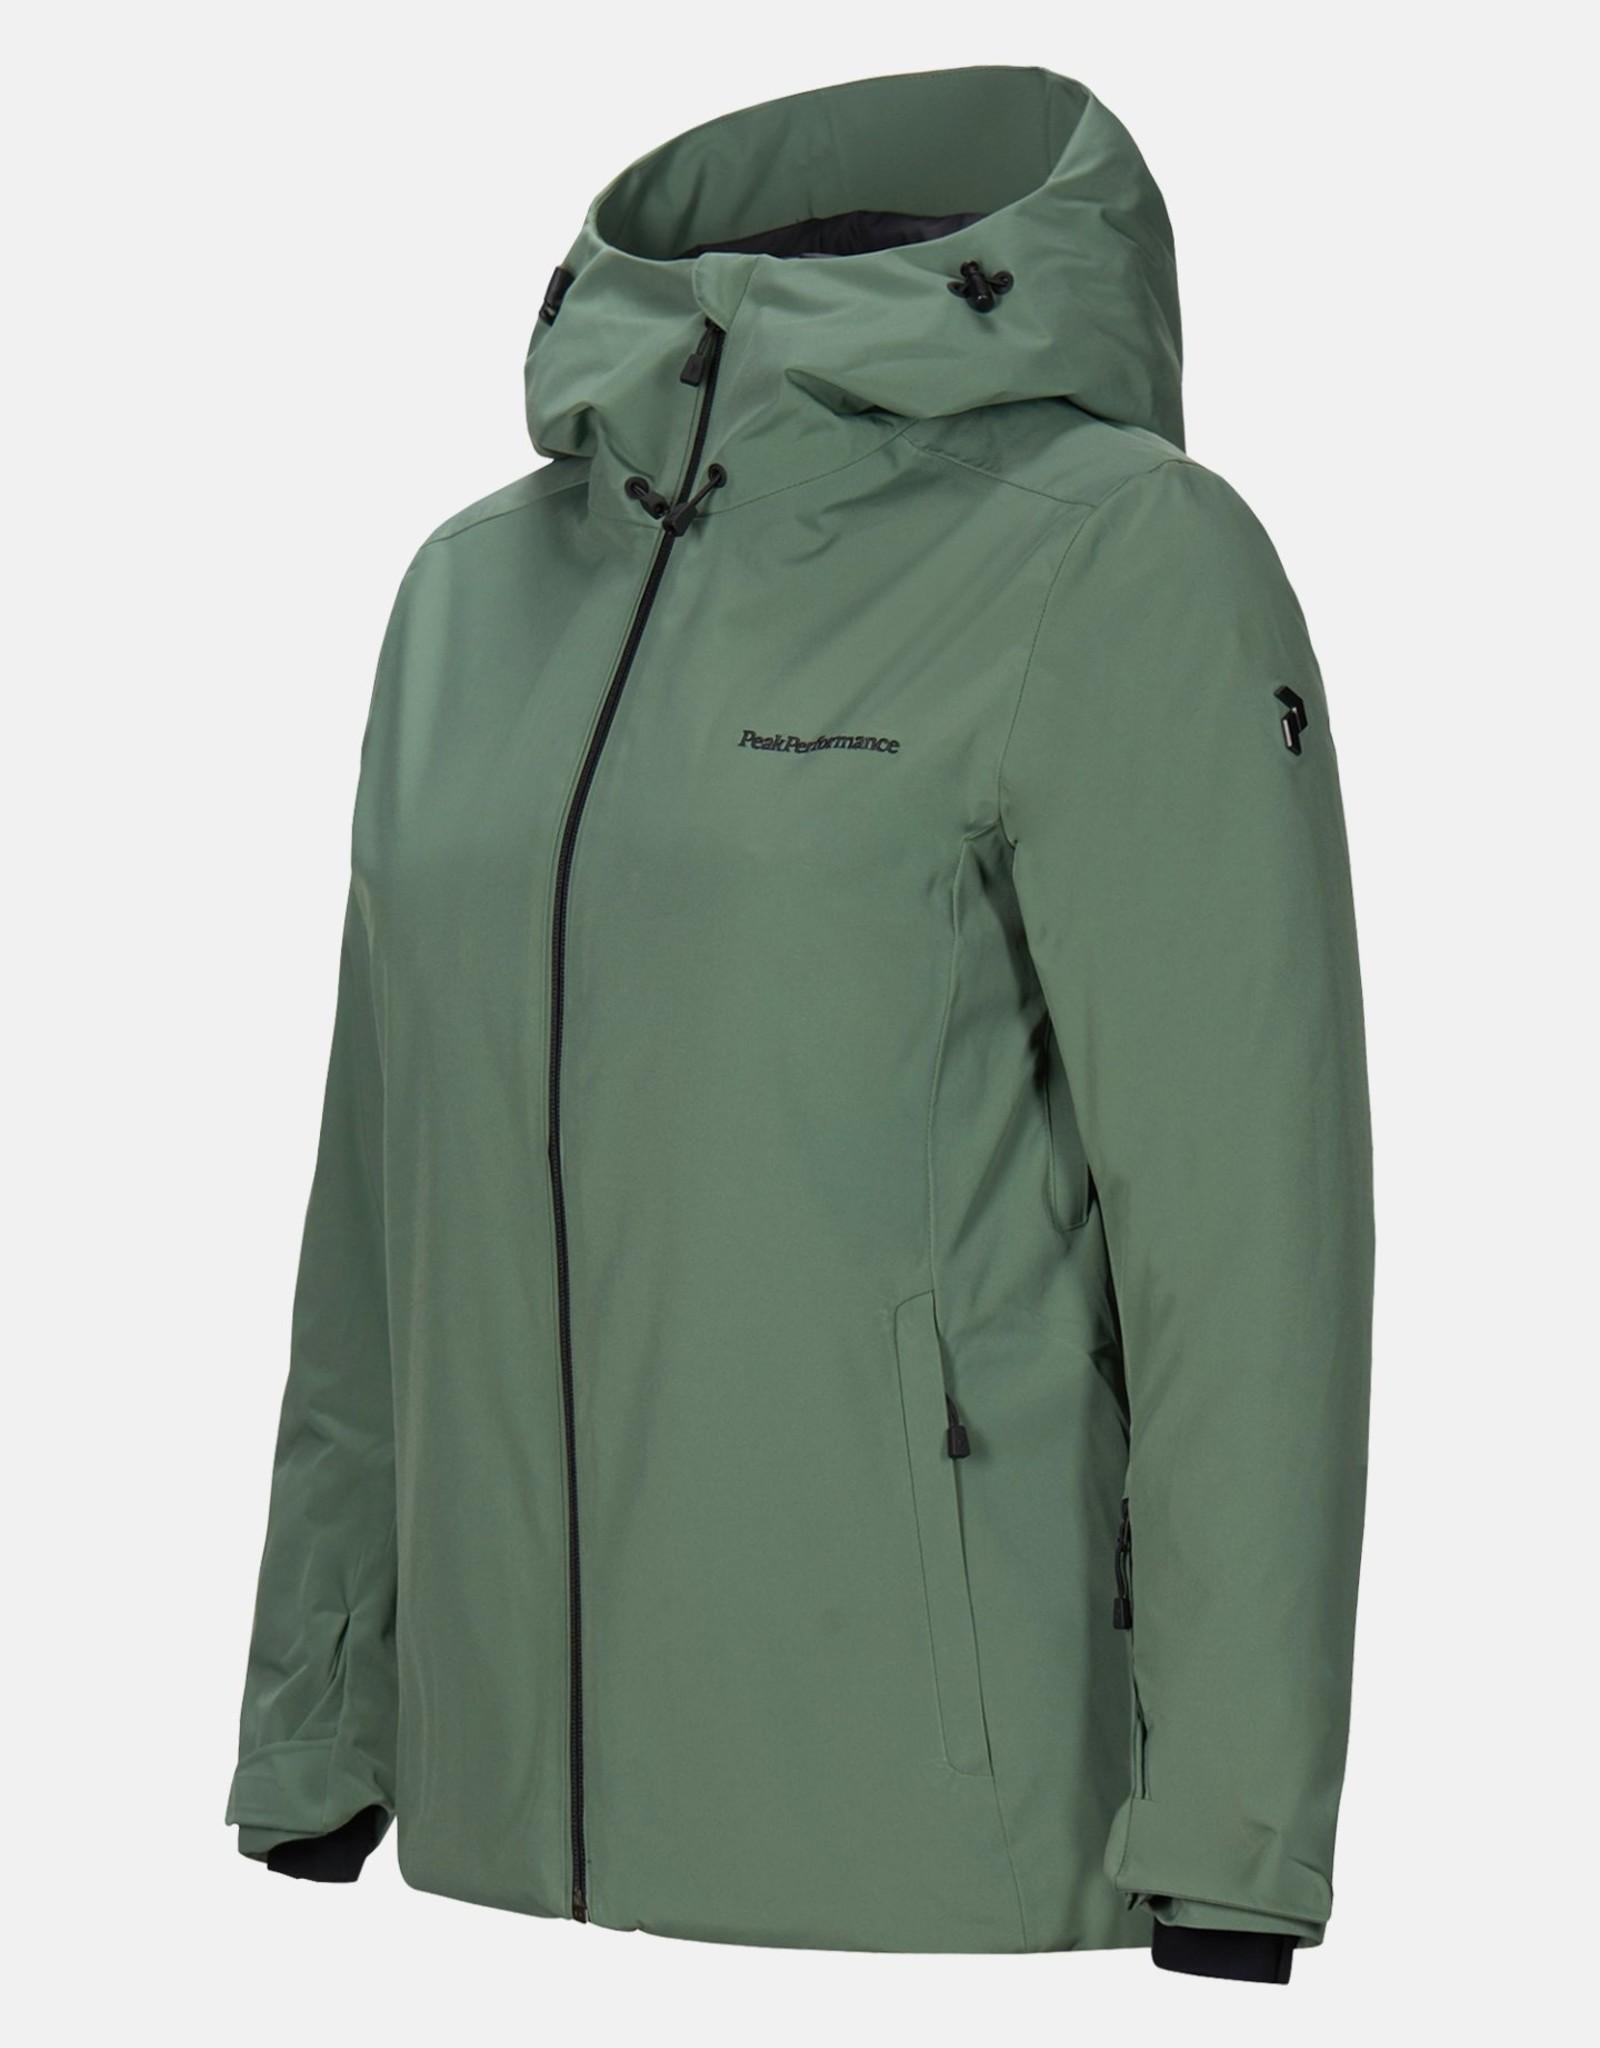 Peak Performance Anima jacket dames (ref G66595008)